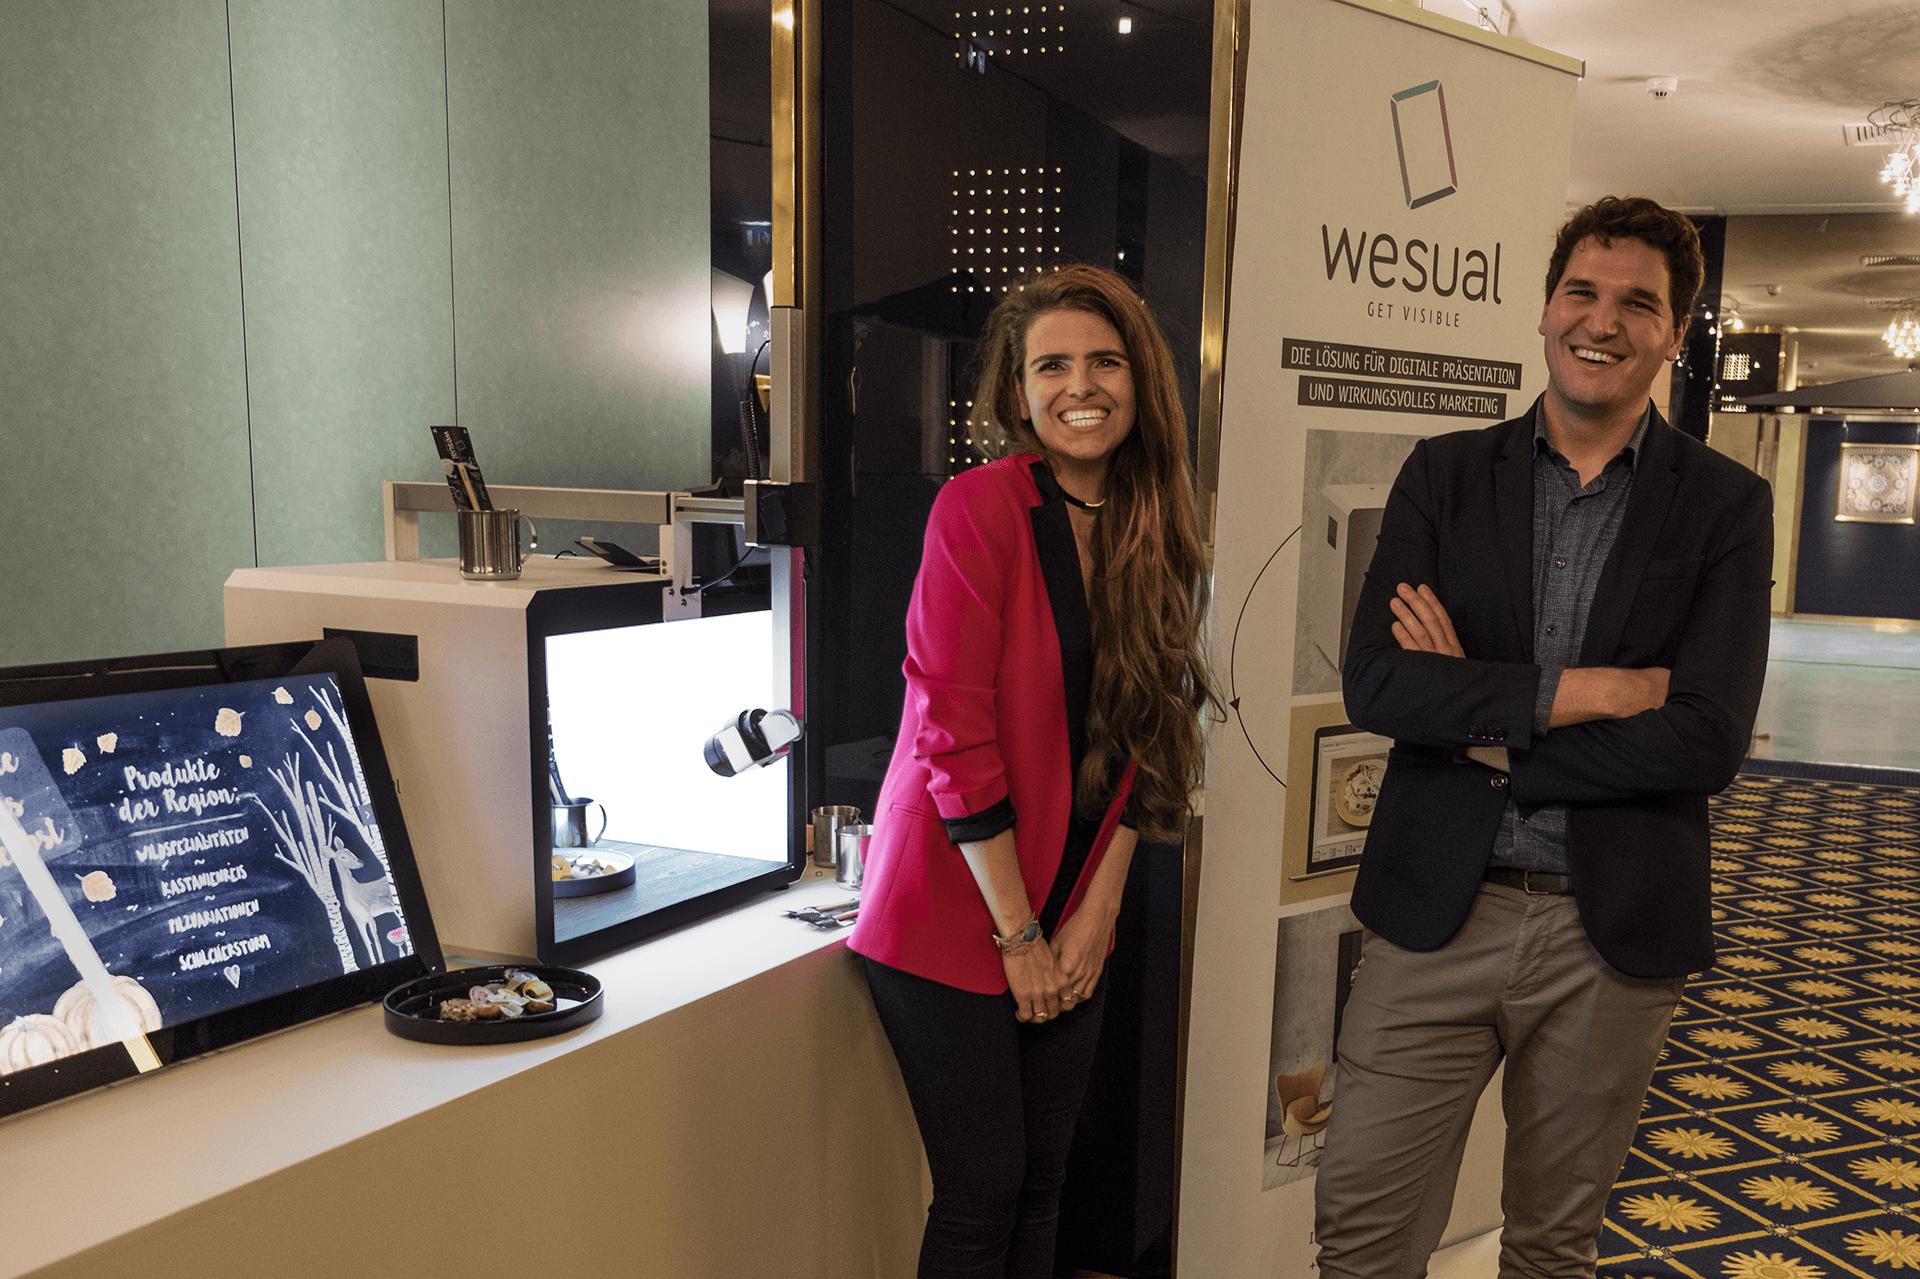 KACHEN Blog Award: WESUAL sponsort den Jurypreis in der Kategorie Food